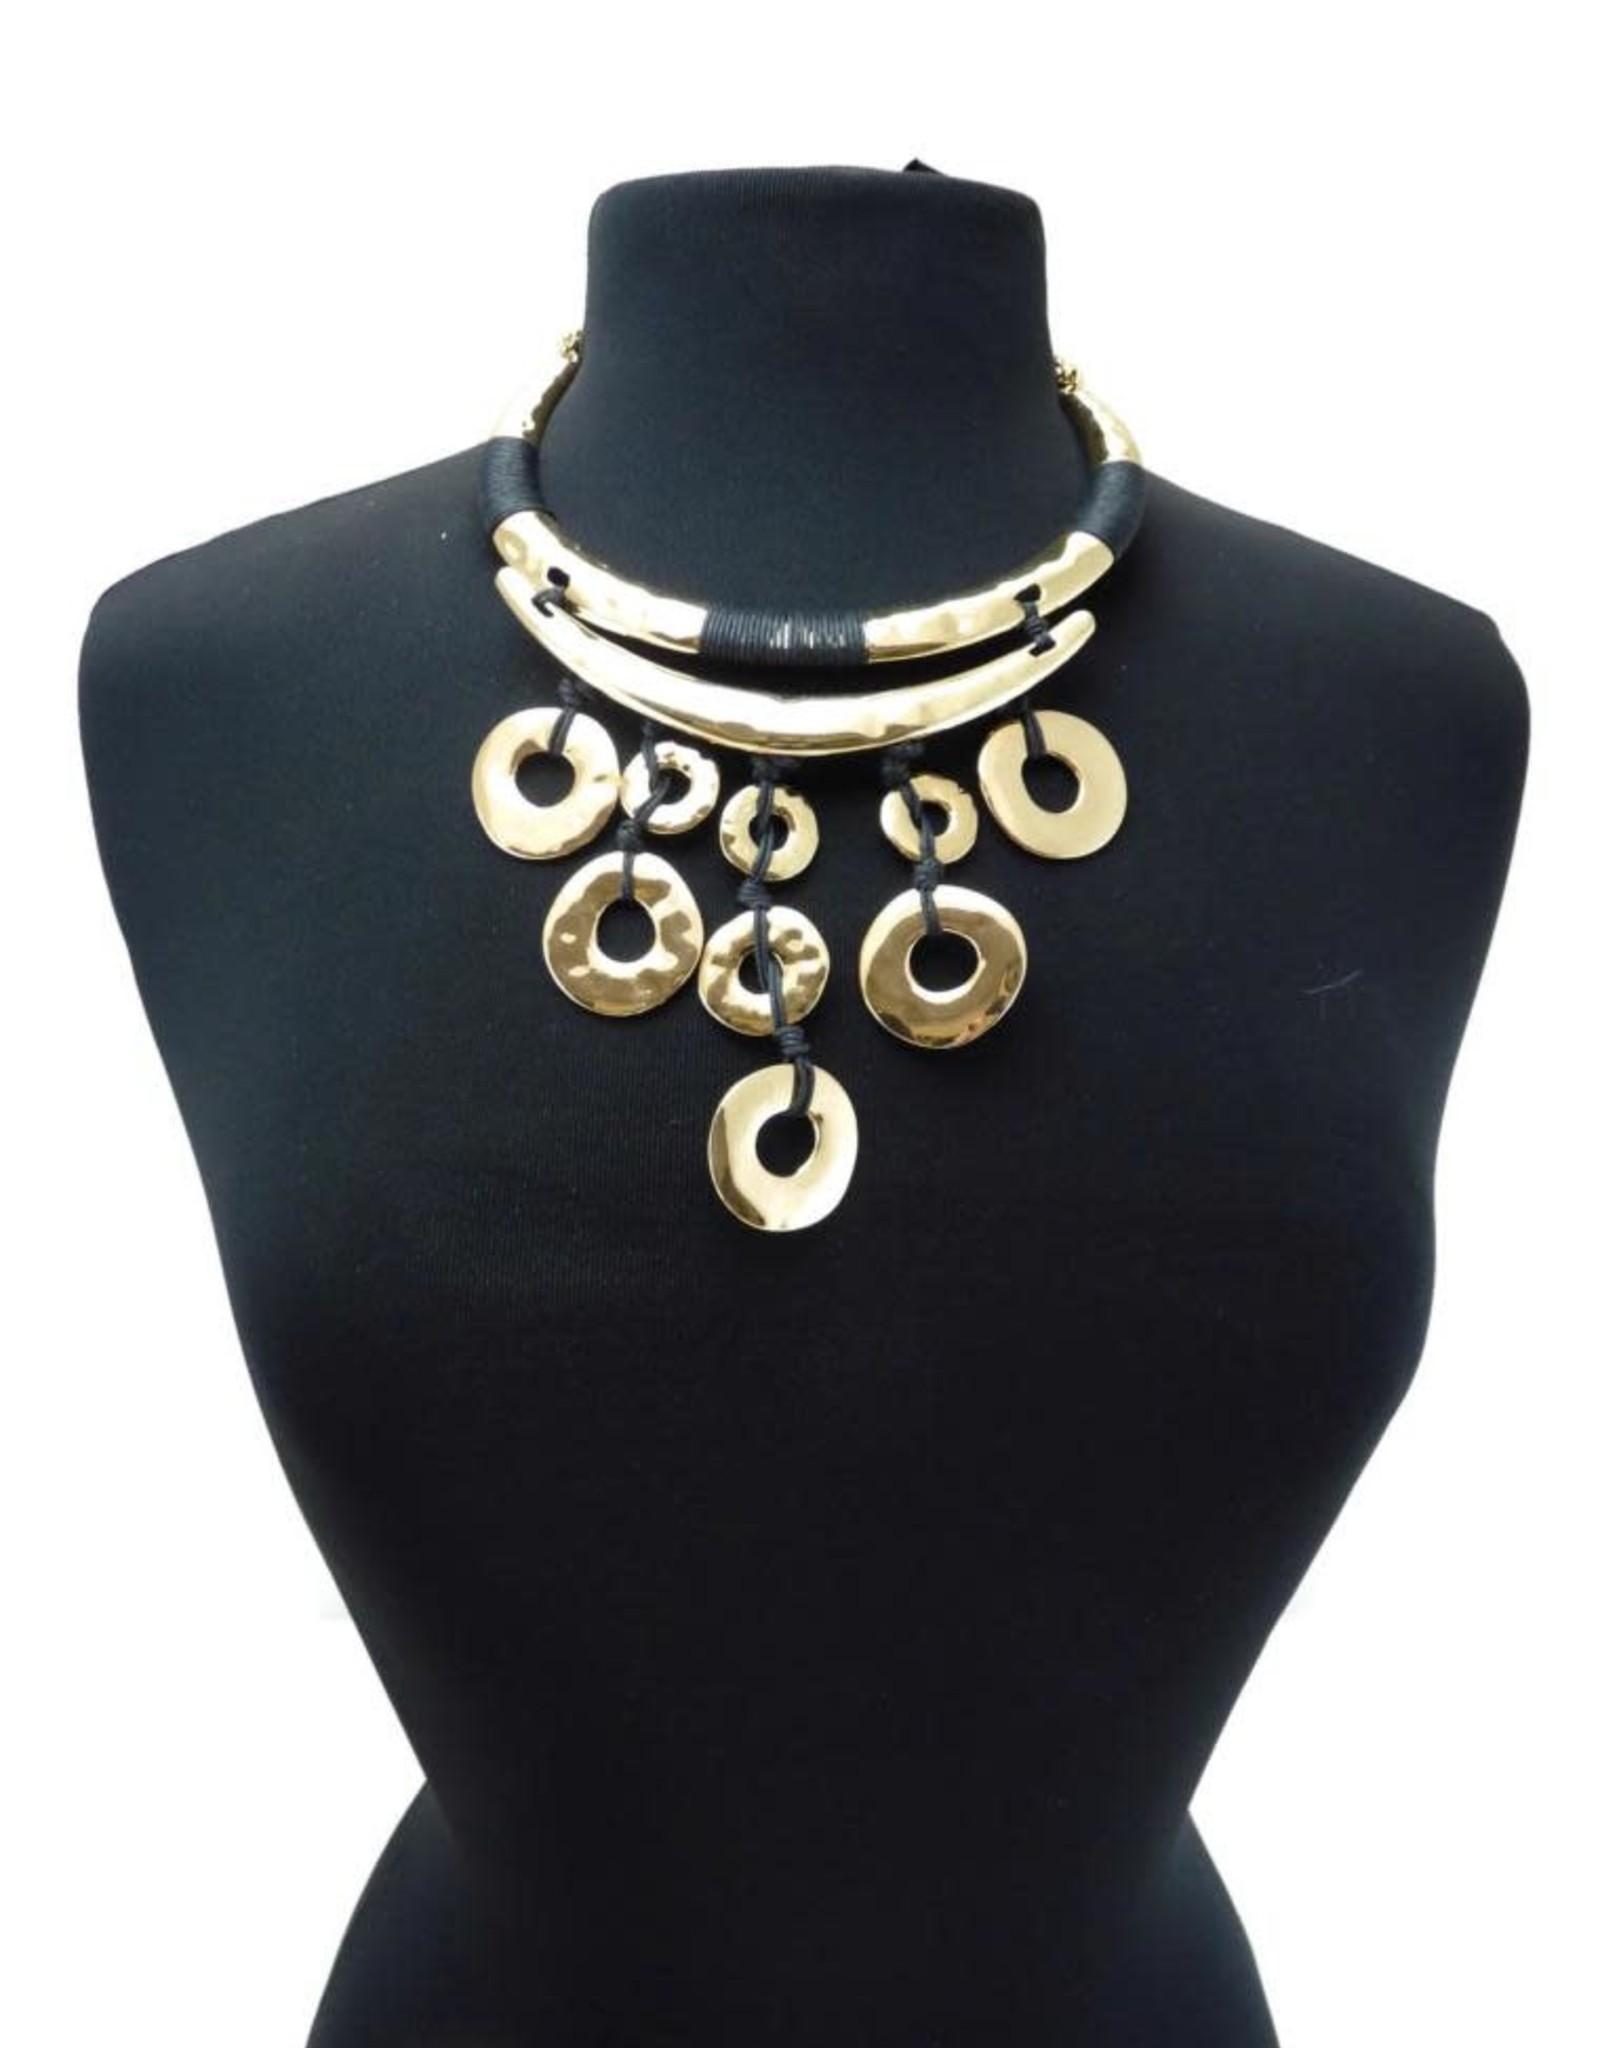 Hammered Gold Black Rope Statement Necklace